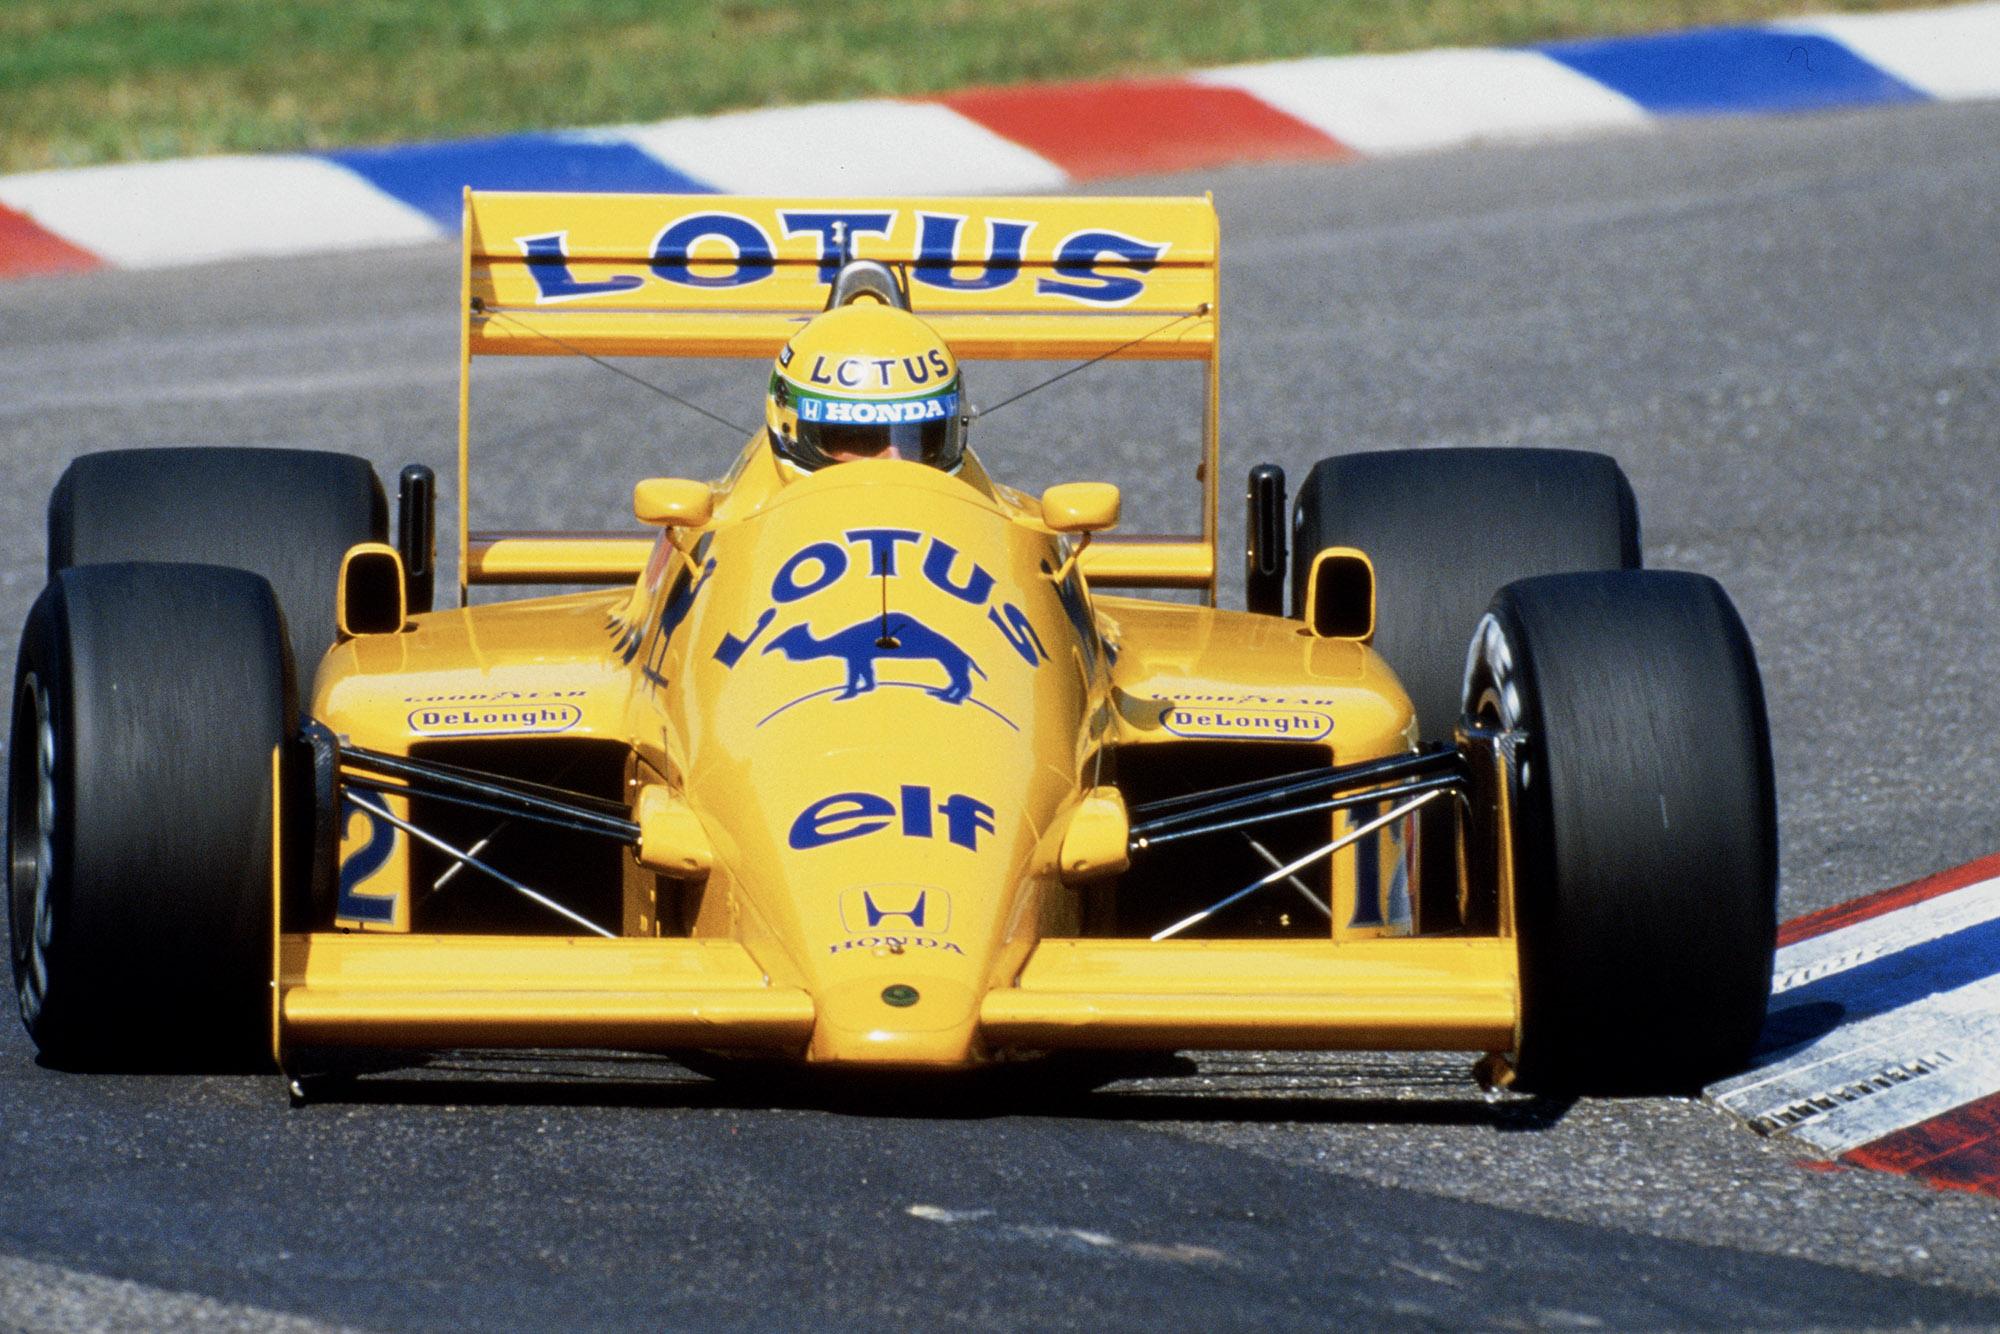 Ayrton Senna in the 1987 Lotus Honda during the German Grand Prix at Hockenheim